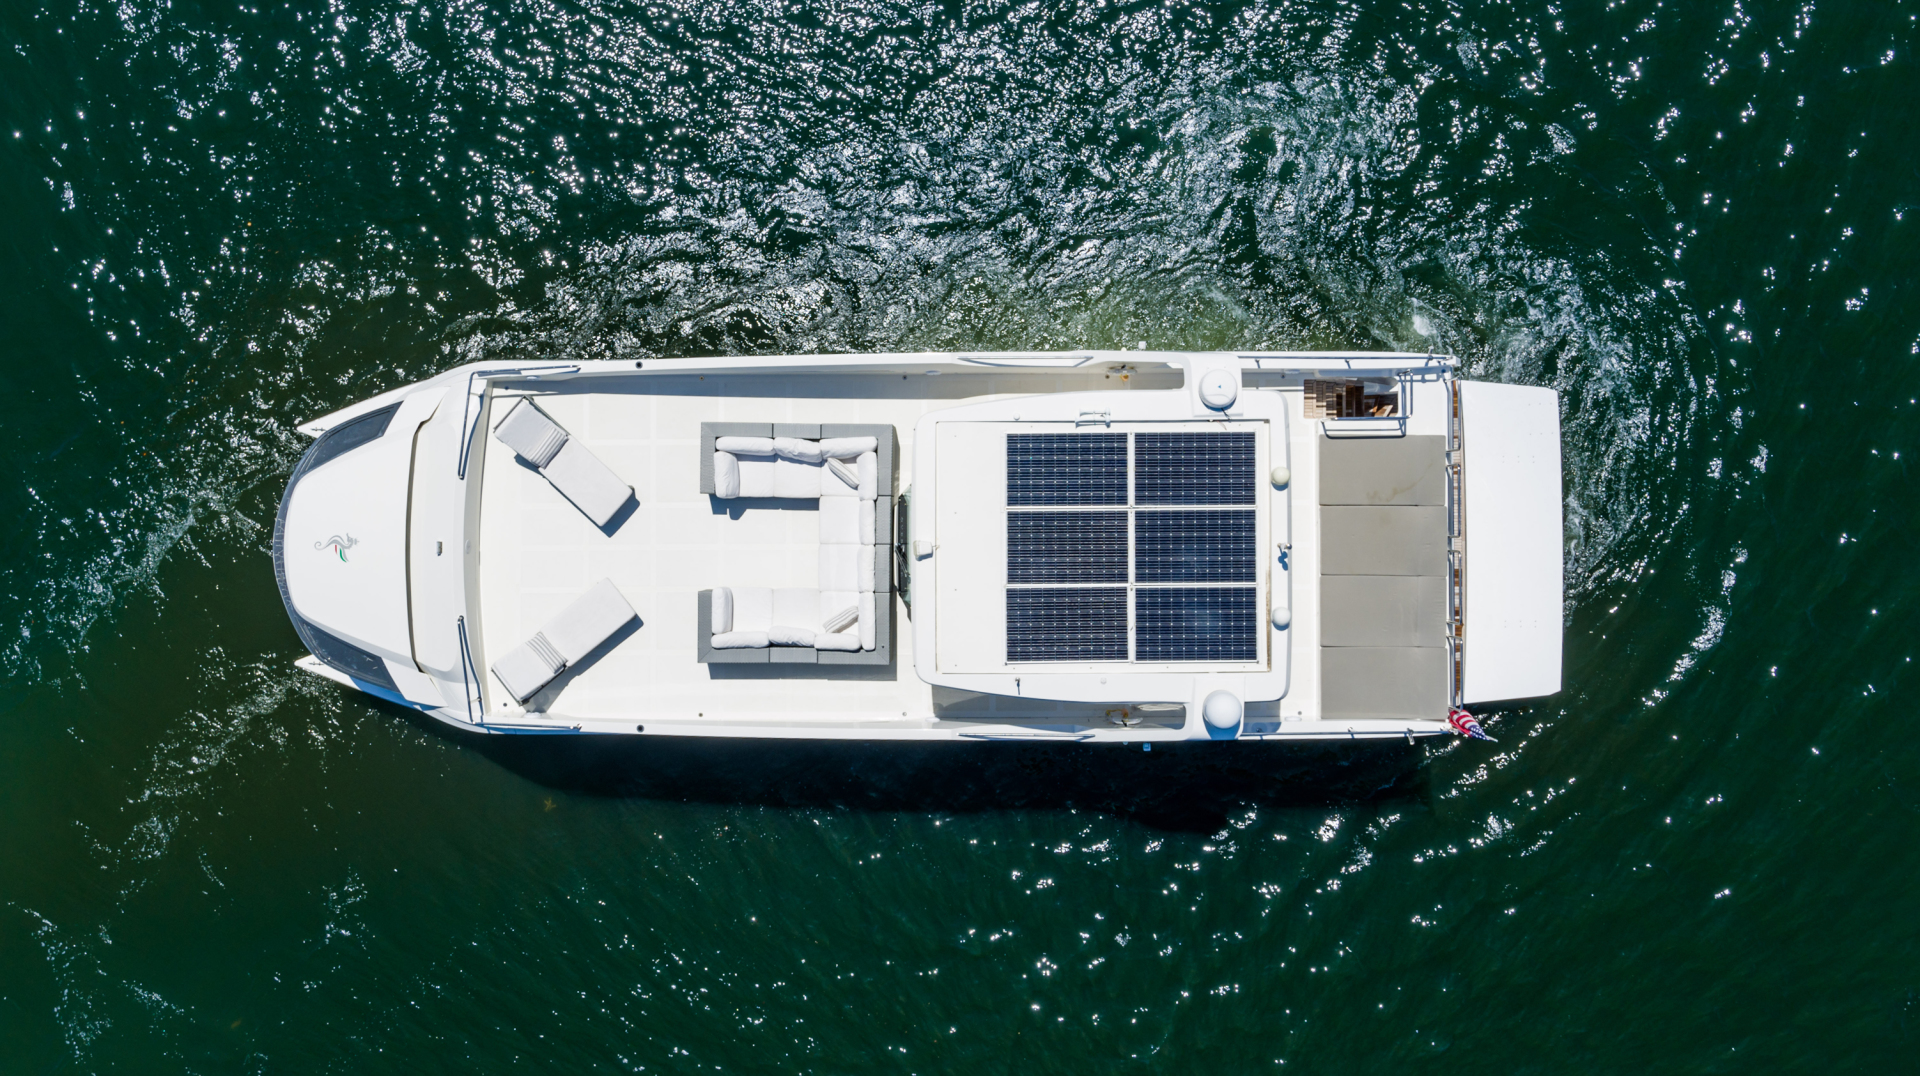 Overblue-58 Power Catamaran 2017-Techuila Ft. Lauderdale-Florida-United States-2017 Overblue 58 Powercat Solar Panels-1401115   Thumbnail